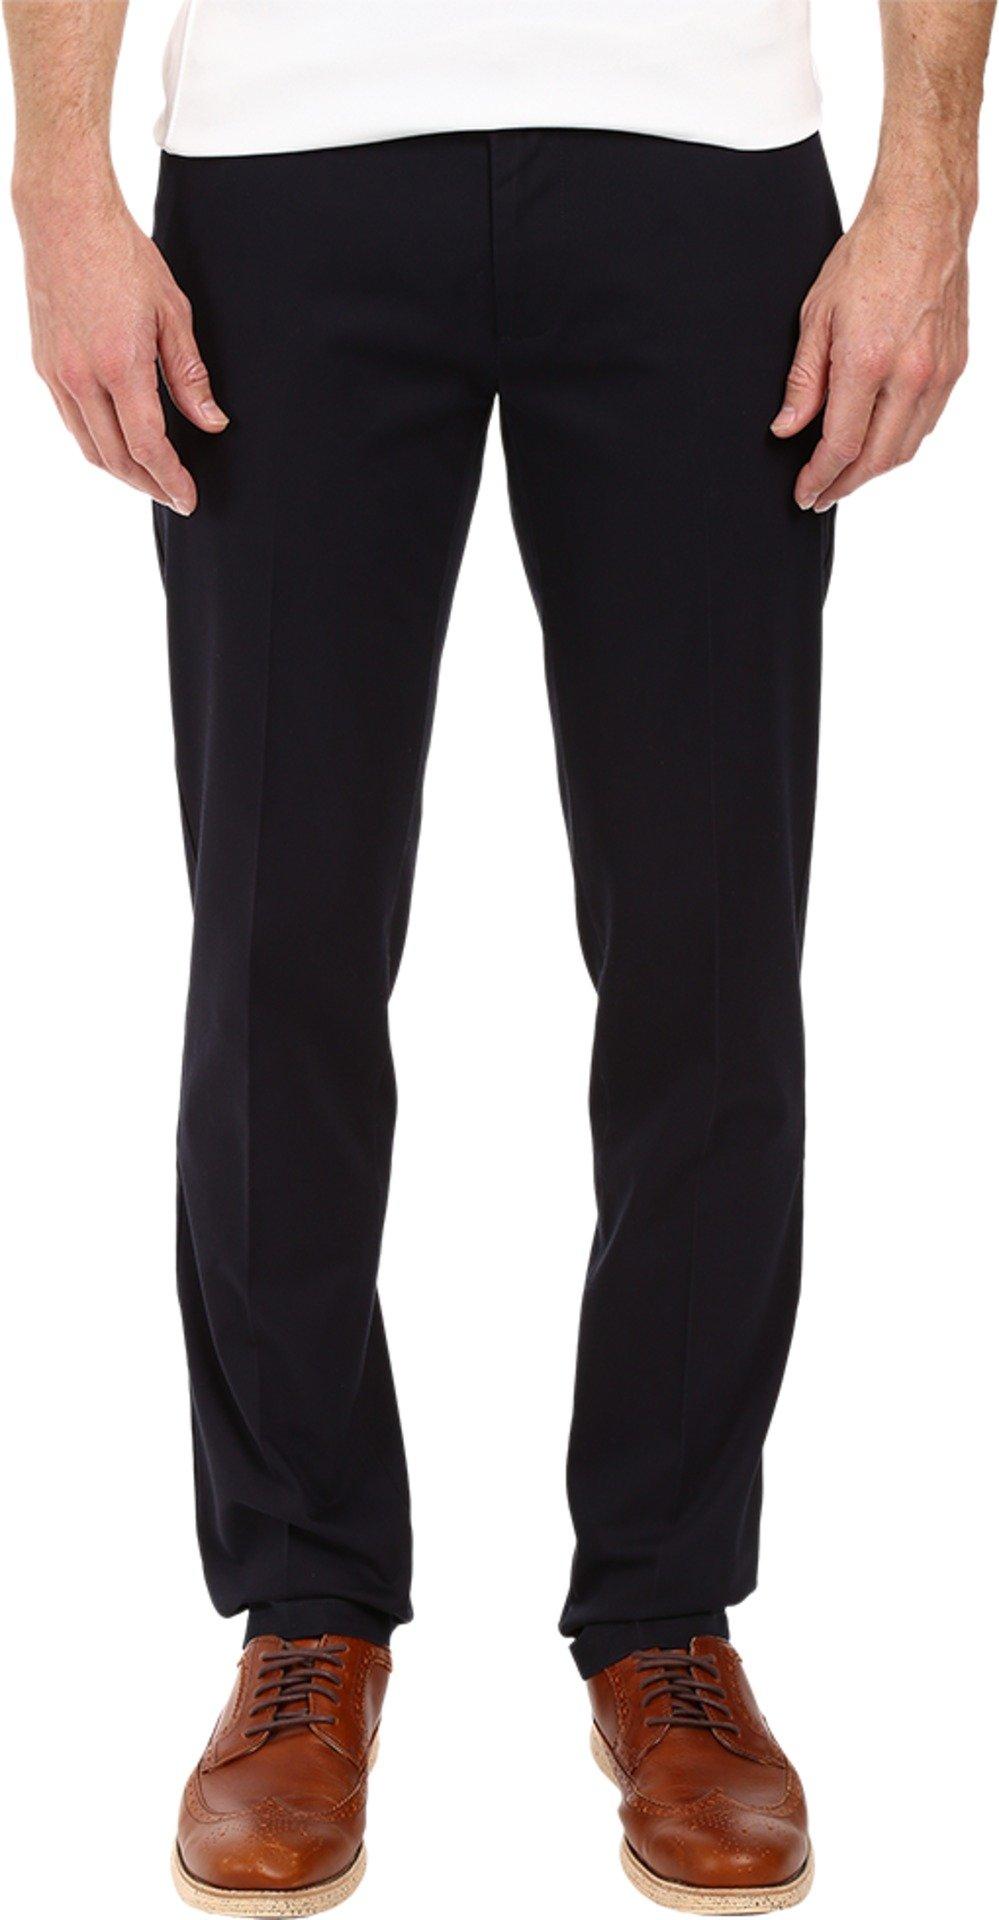 Dockers Men's Slim Tapered Fit Signature Khaki Pants, Navy (Stretch),32W x 32L